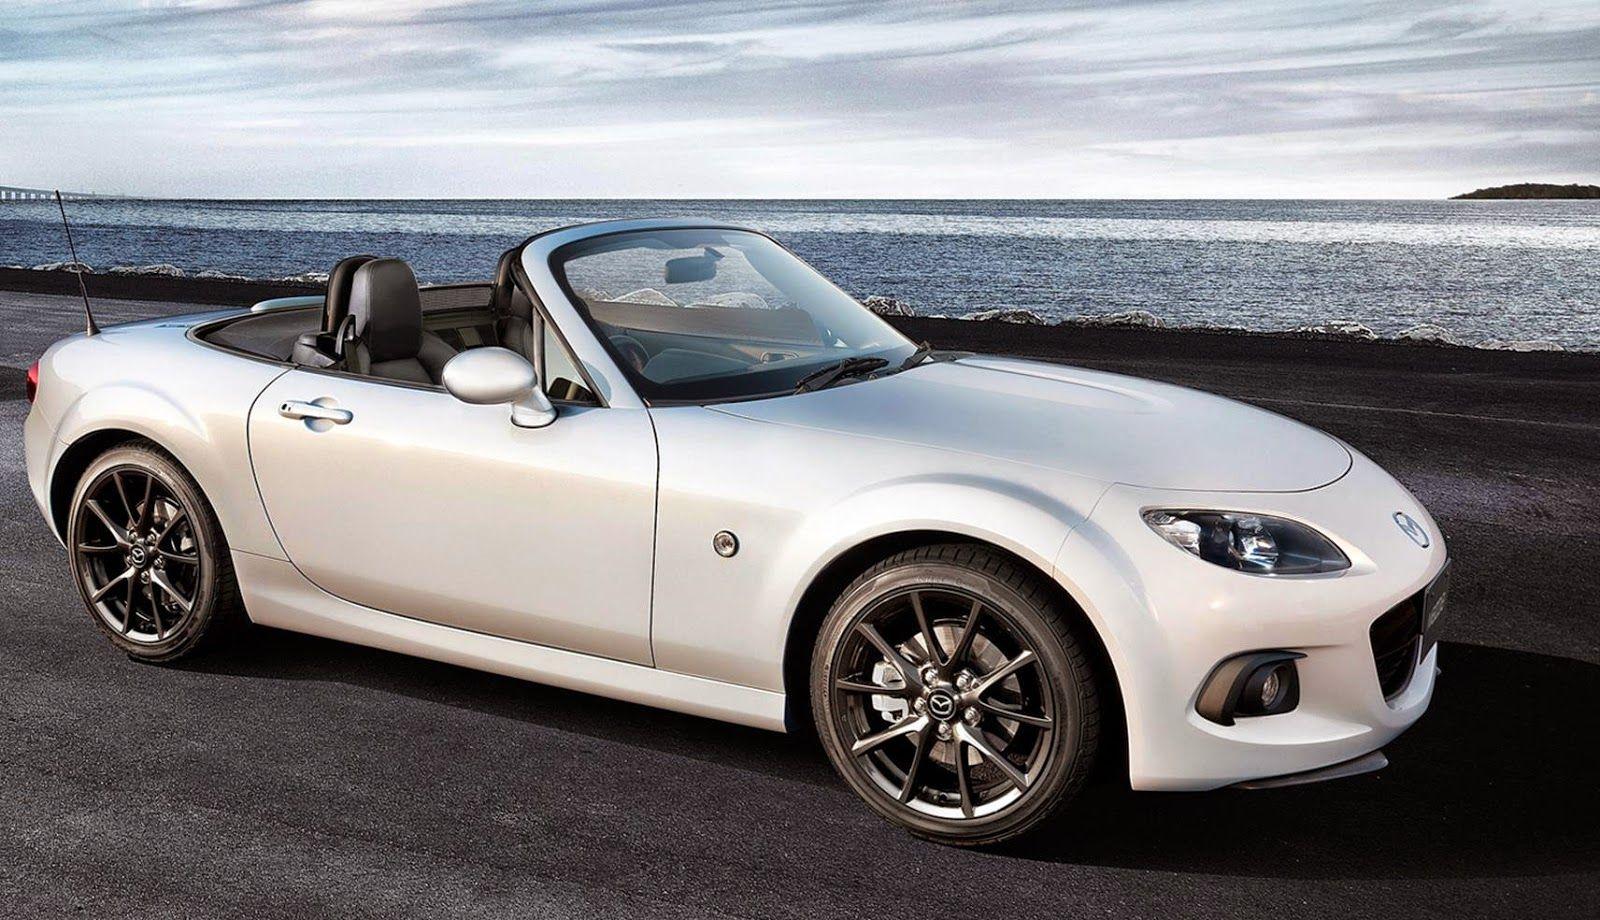 AUTO CARS, BIKES & VEHICLES Mazda MX5 Light Weight